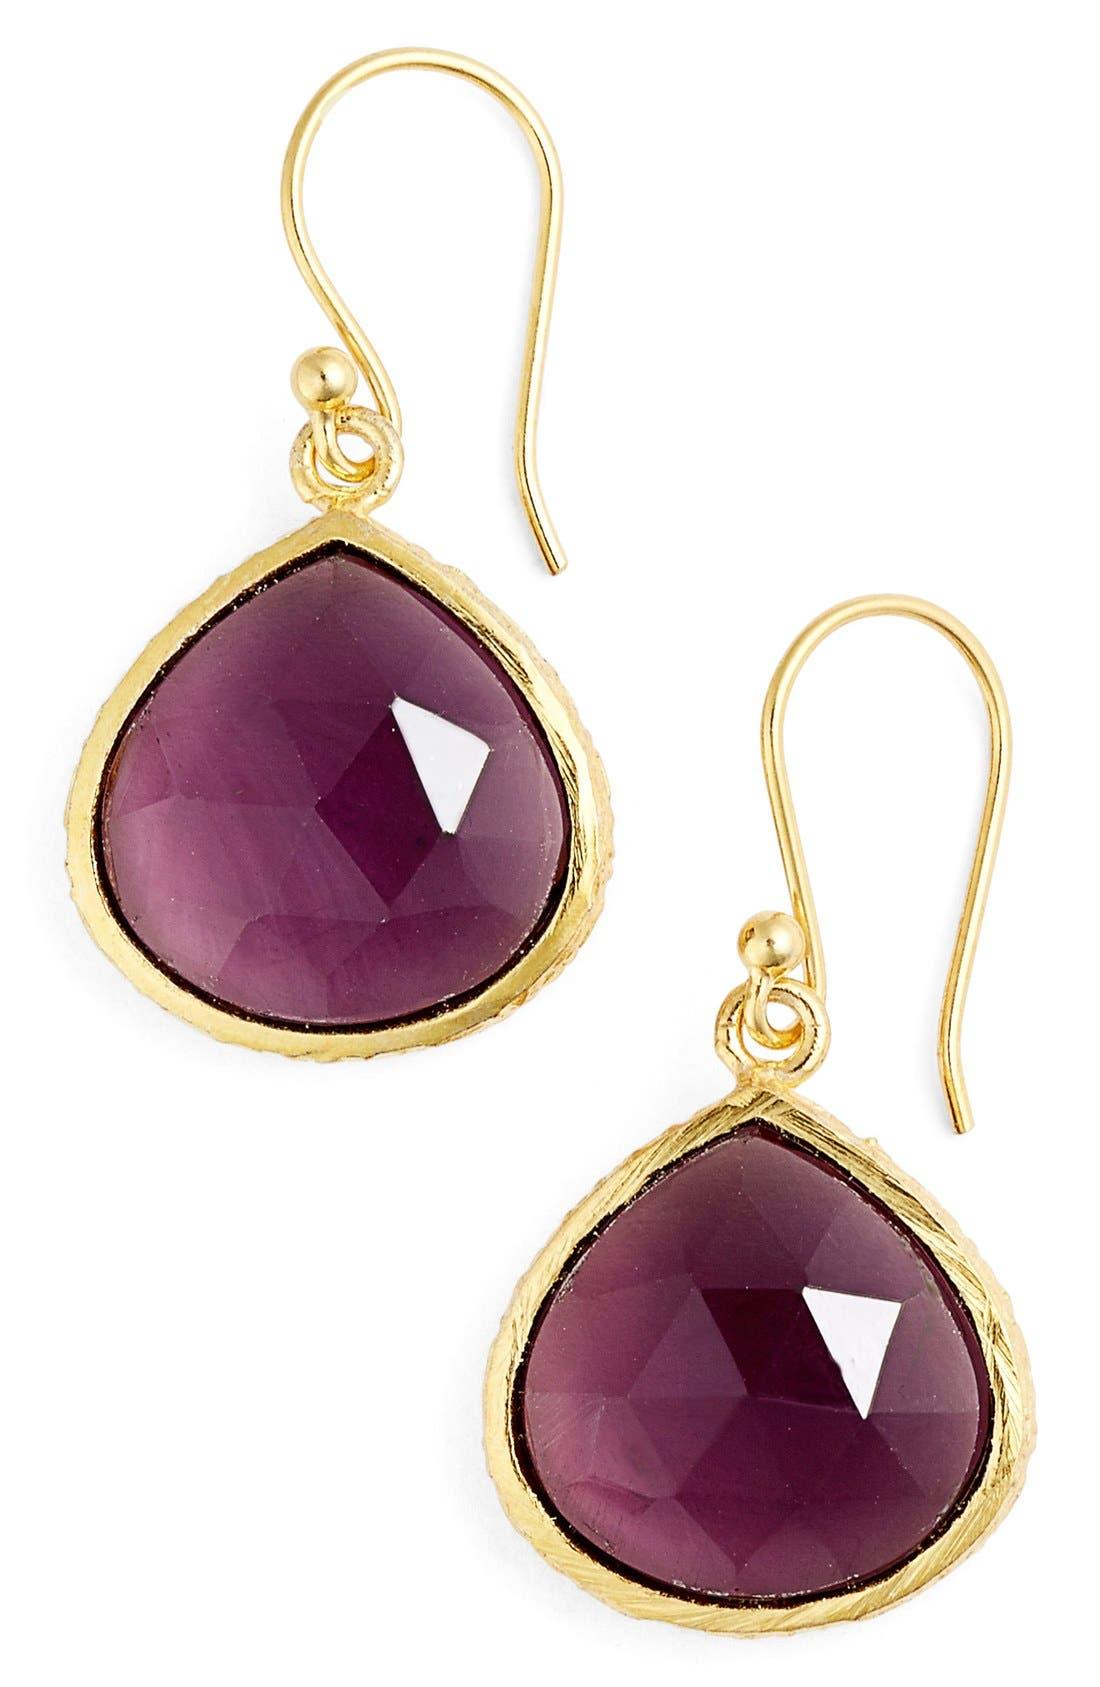 Main Image - sonyarenee 'Nicole'Semiprecious Stone Drop Earrings